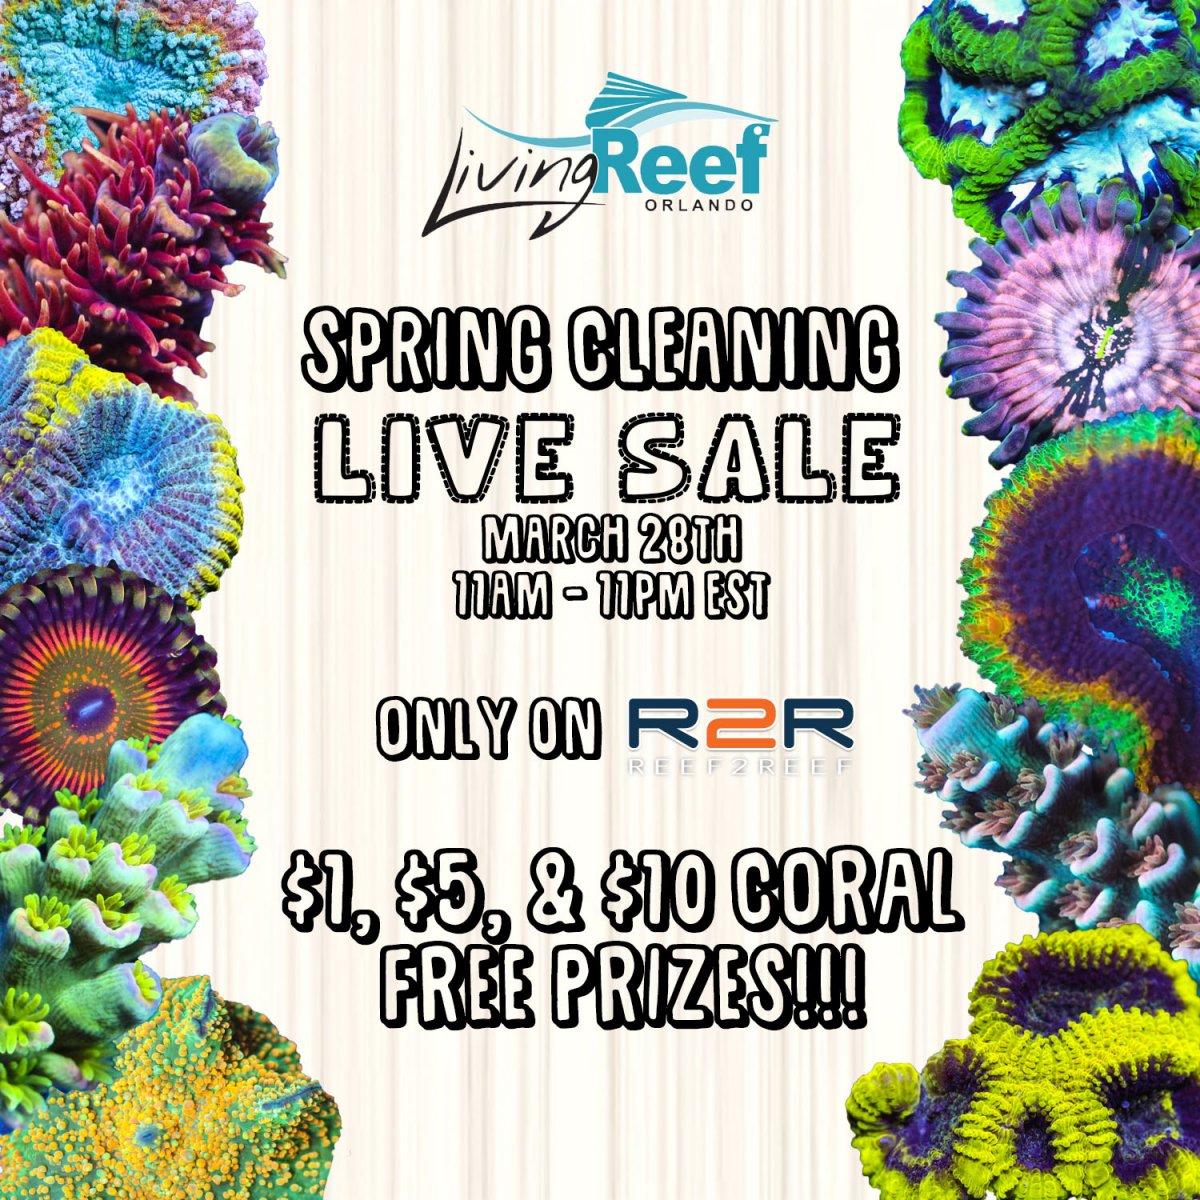 live sale flyer.jpg